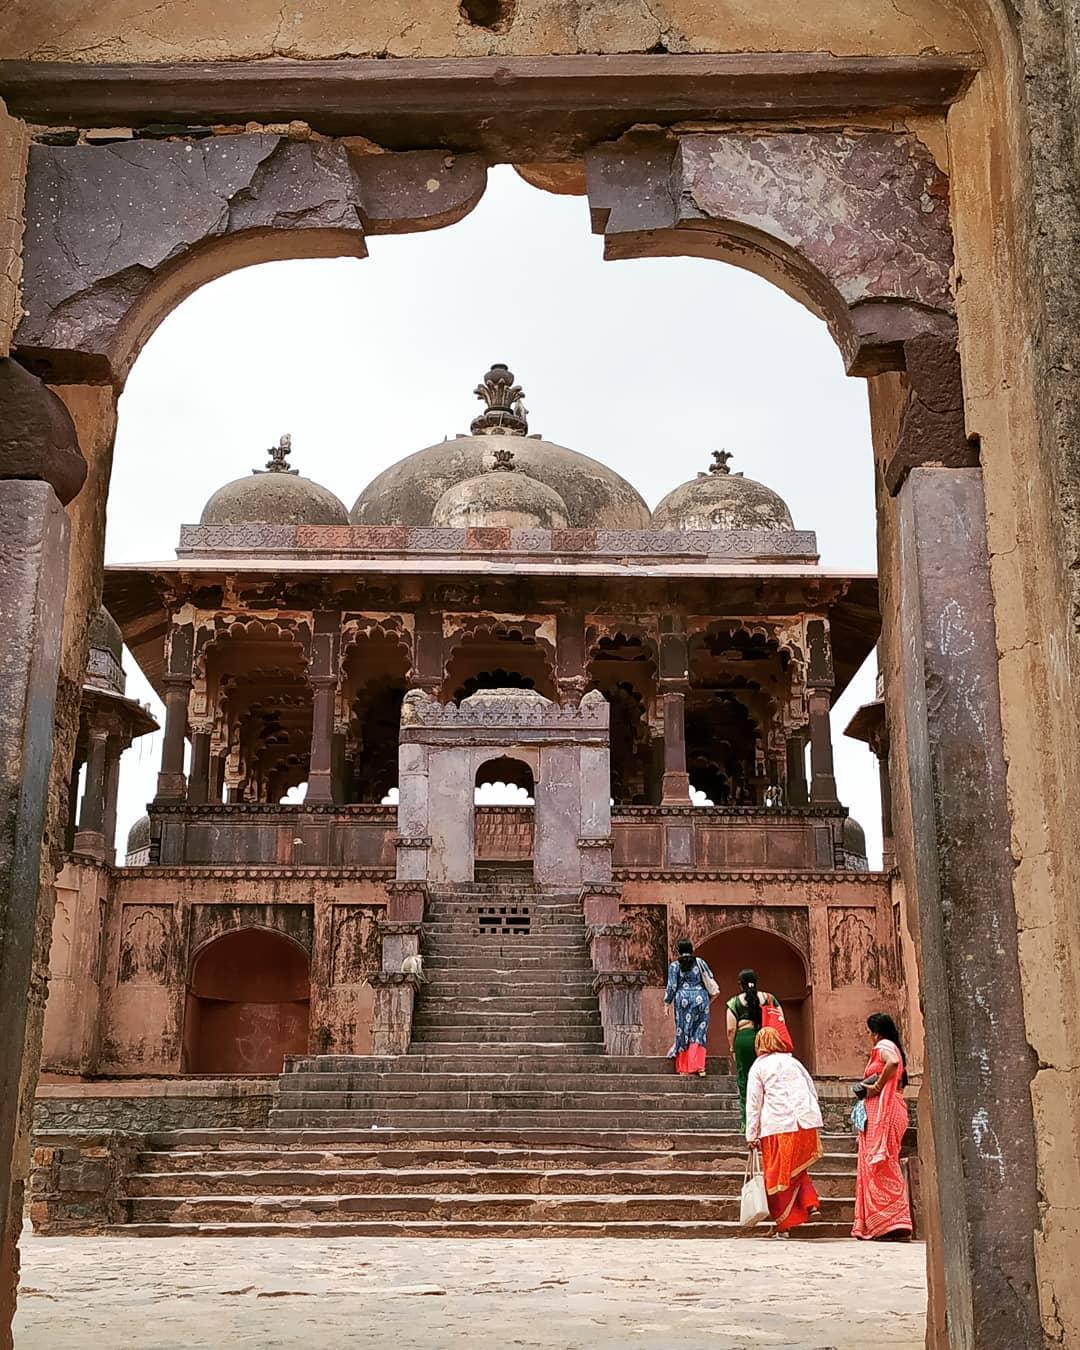 Ranthambore Fort, Sawai Madhopur